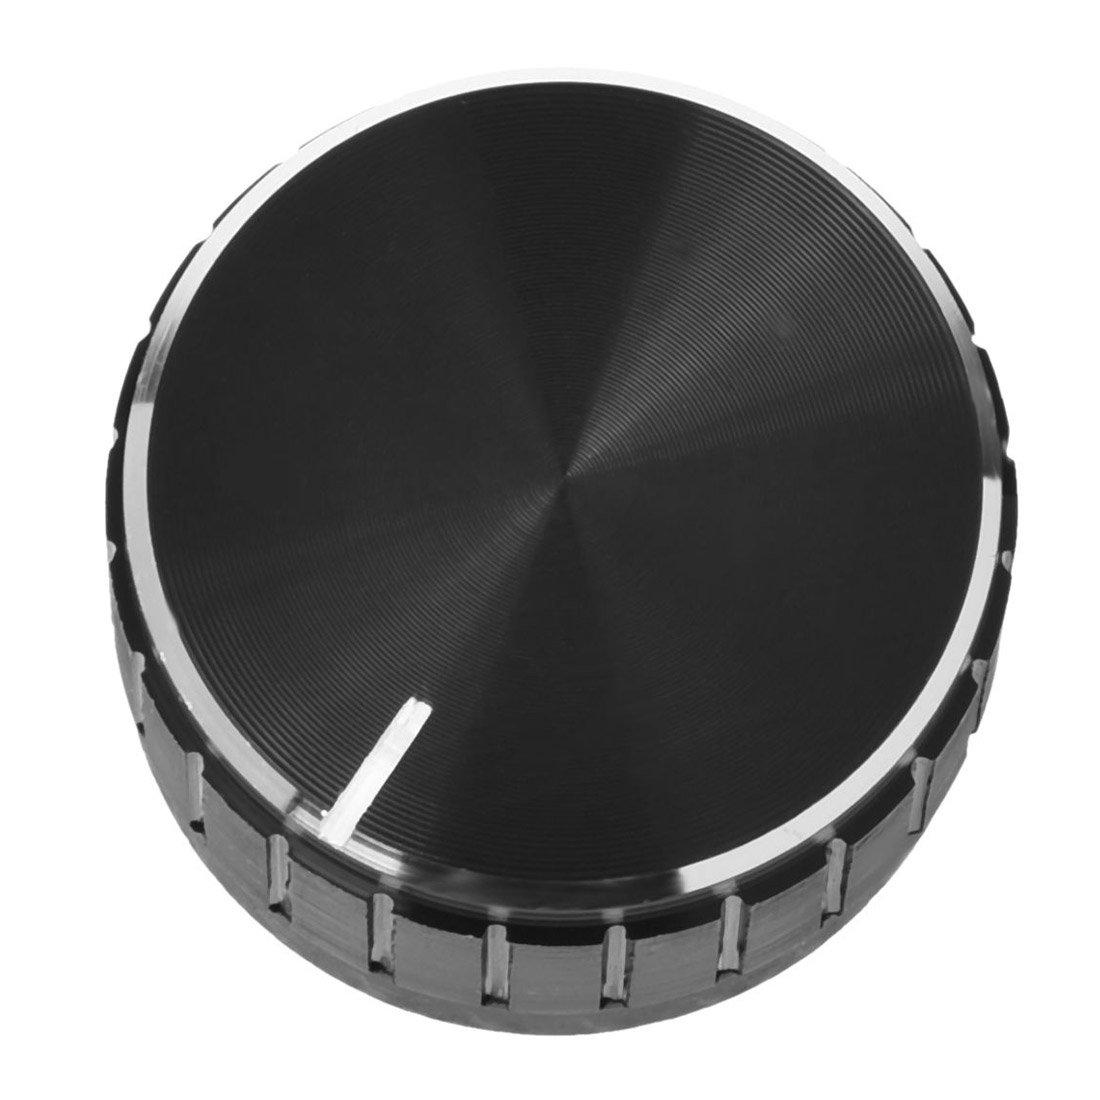 SODIAL(R) Black Aluminum Volume Control Amplifier Knob Wheel